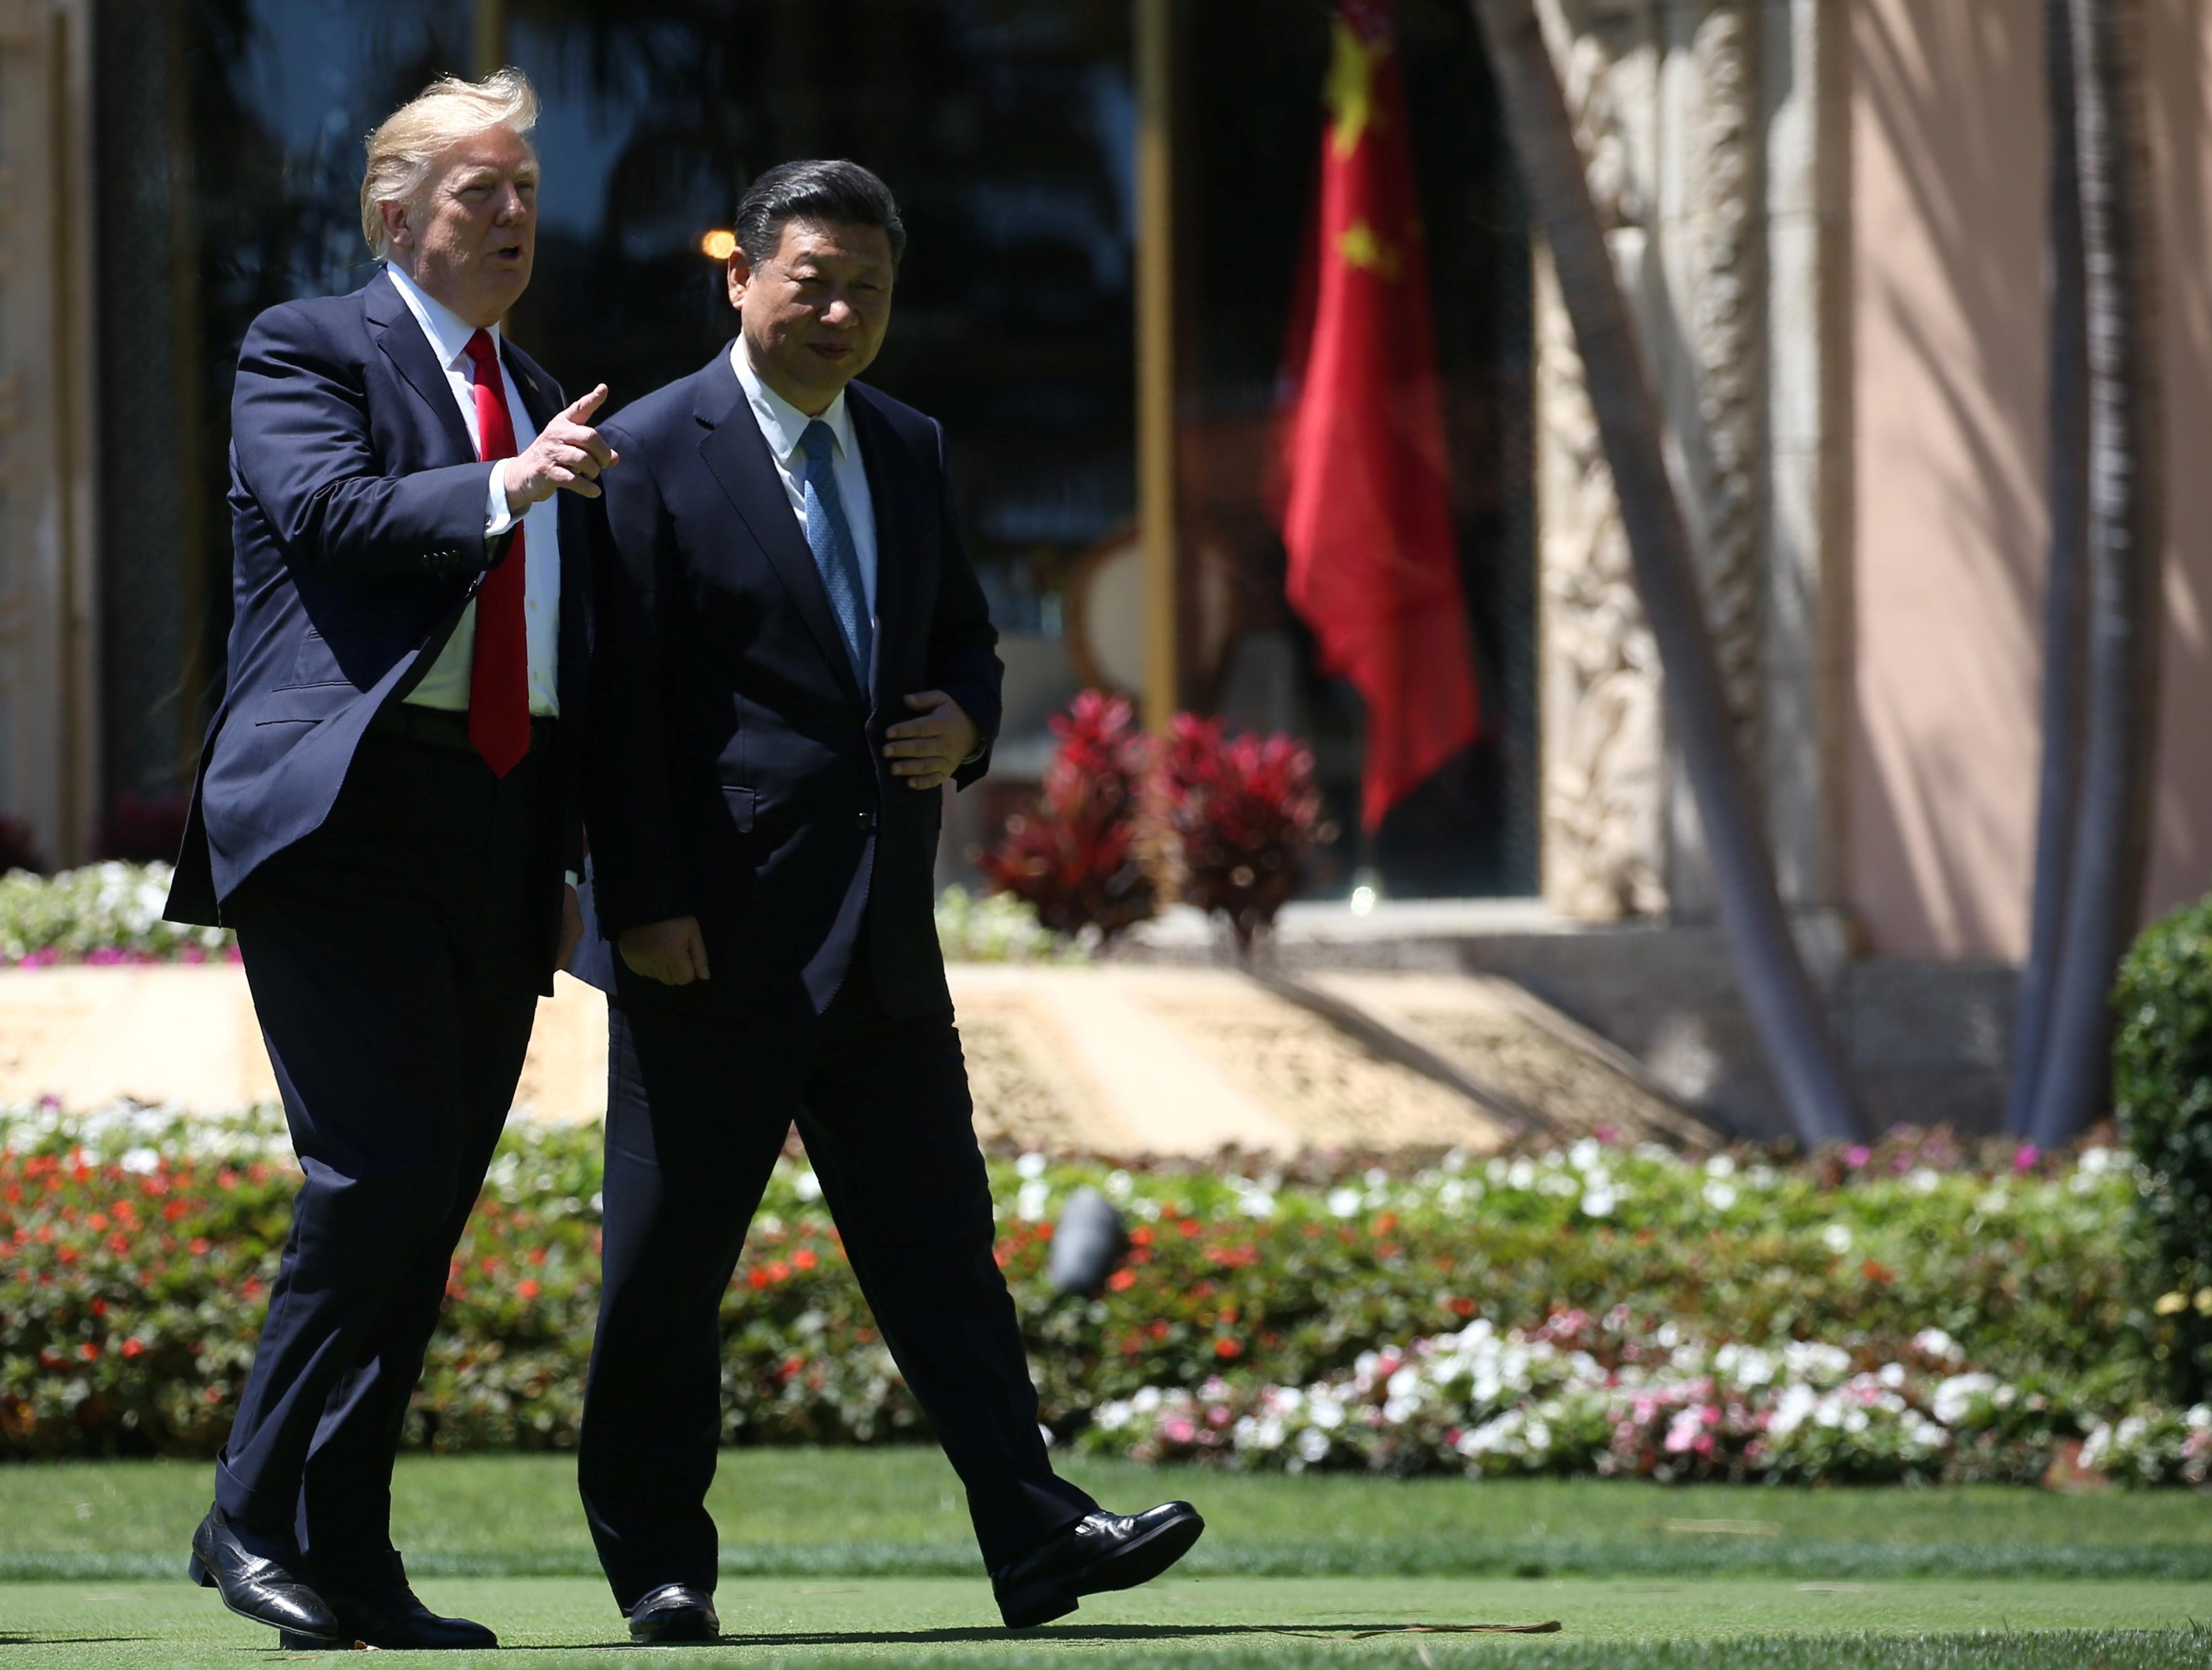 U.S. President Donald Trump (L) and China's President Xi Jinping take a walk together after a bilateral meeting at Trump's Mar-a-Lago estate in Palm Beach, Florida, U.S., April 7, 2017. REUTERS/Carlos Barria